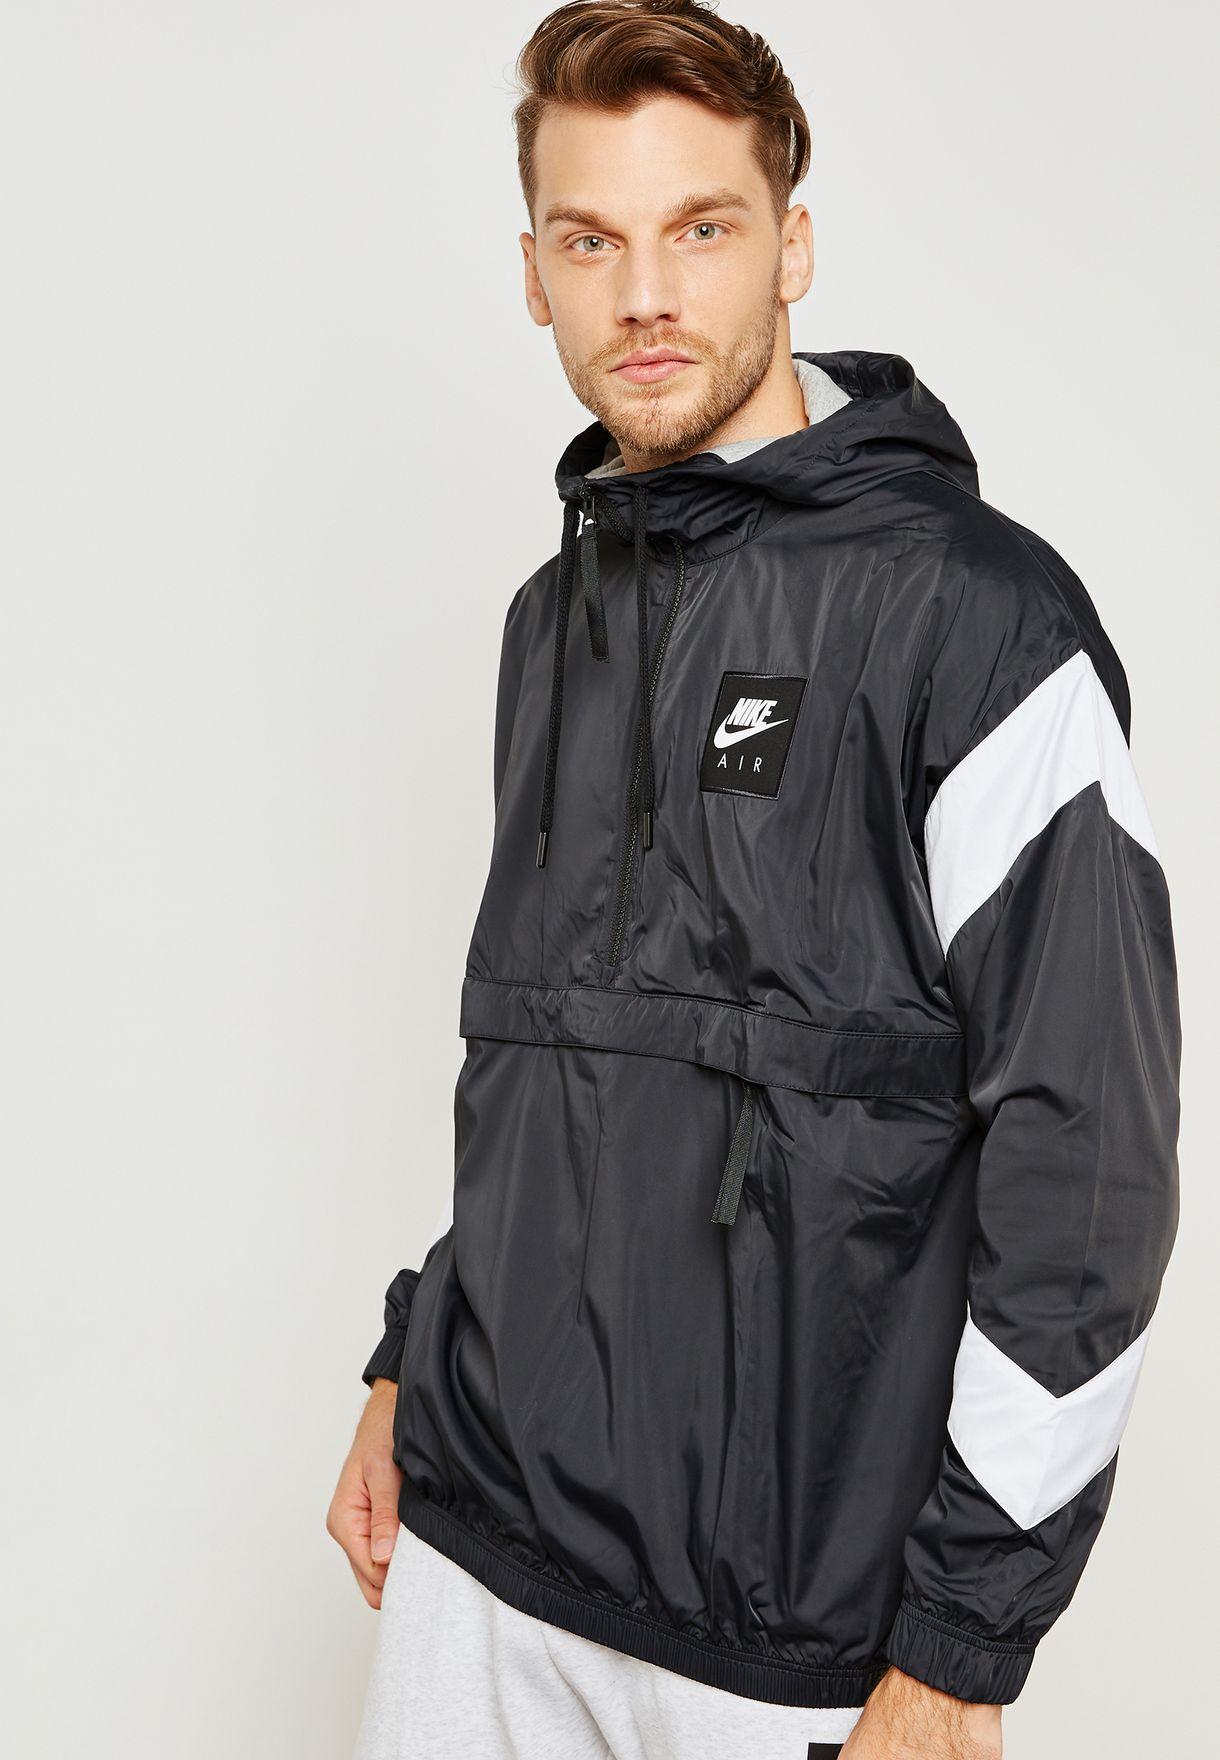 a801e670efe8 Shop Nike black Air Hooded Jacket 932137-010 for Men in Saudi ...